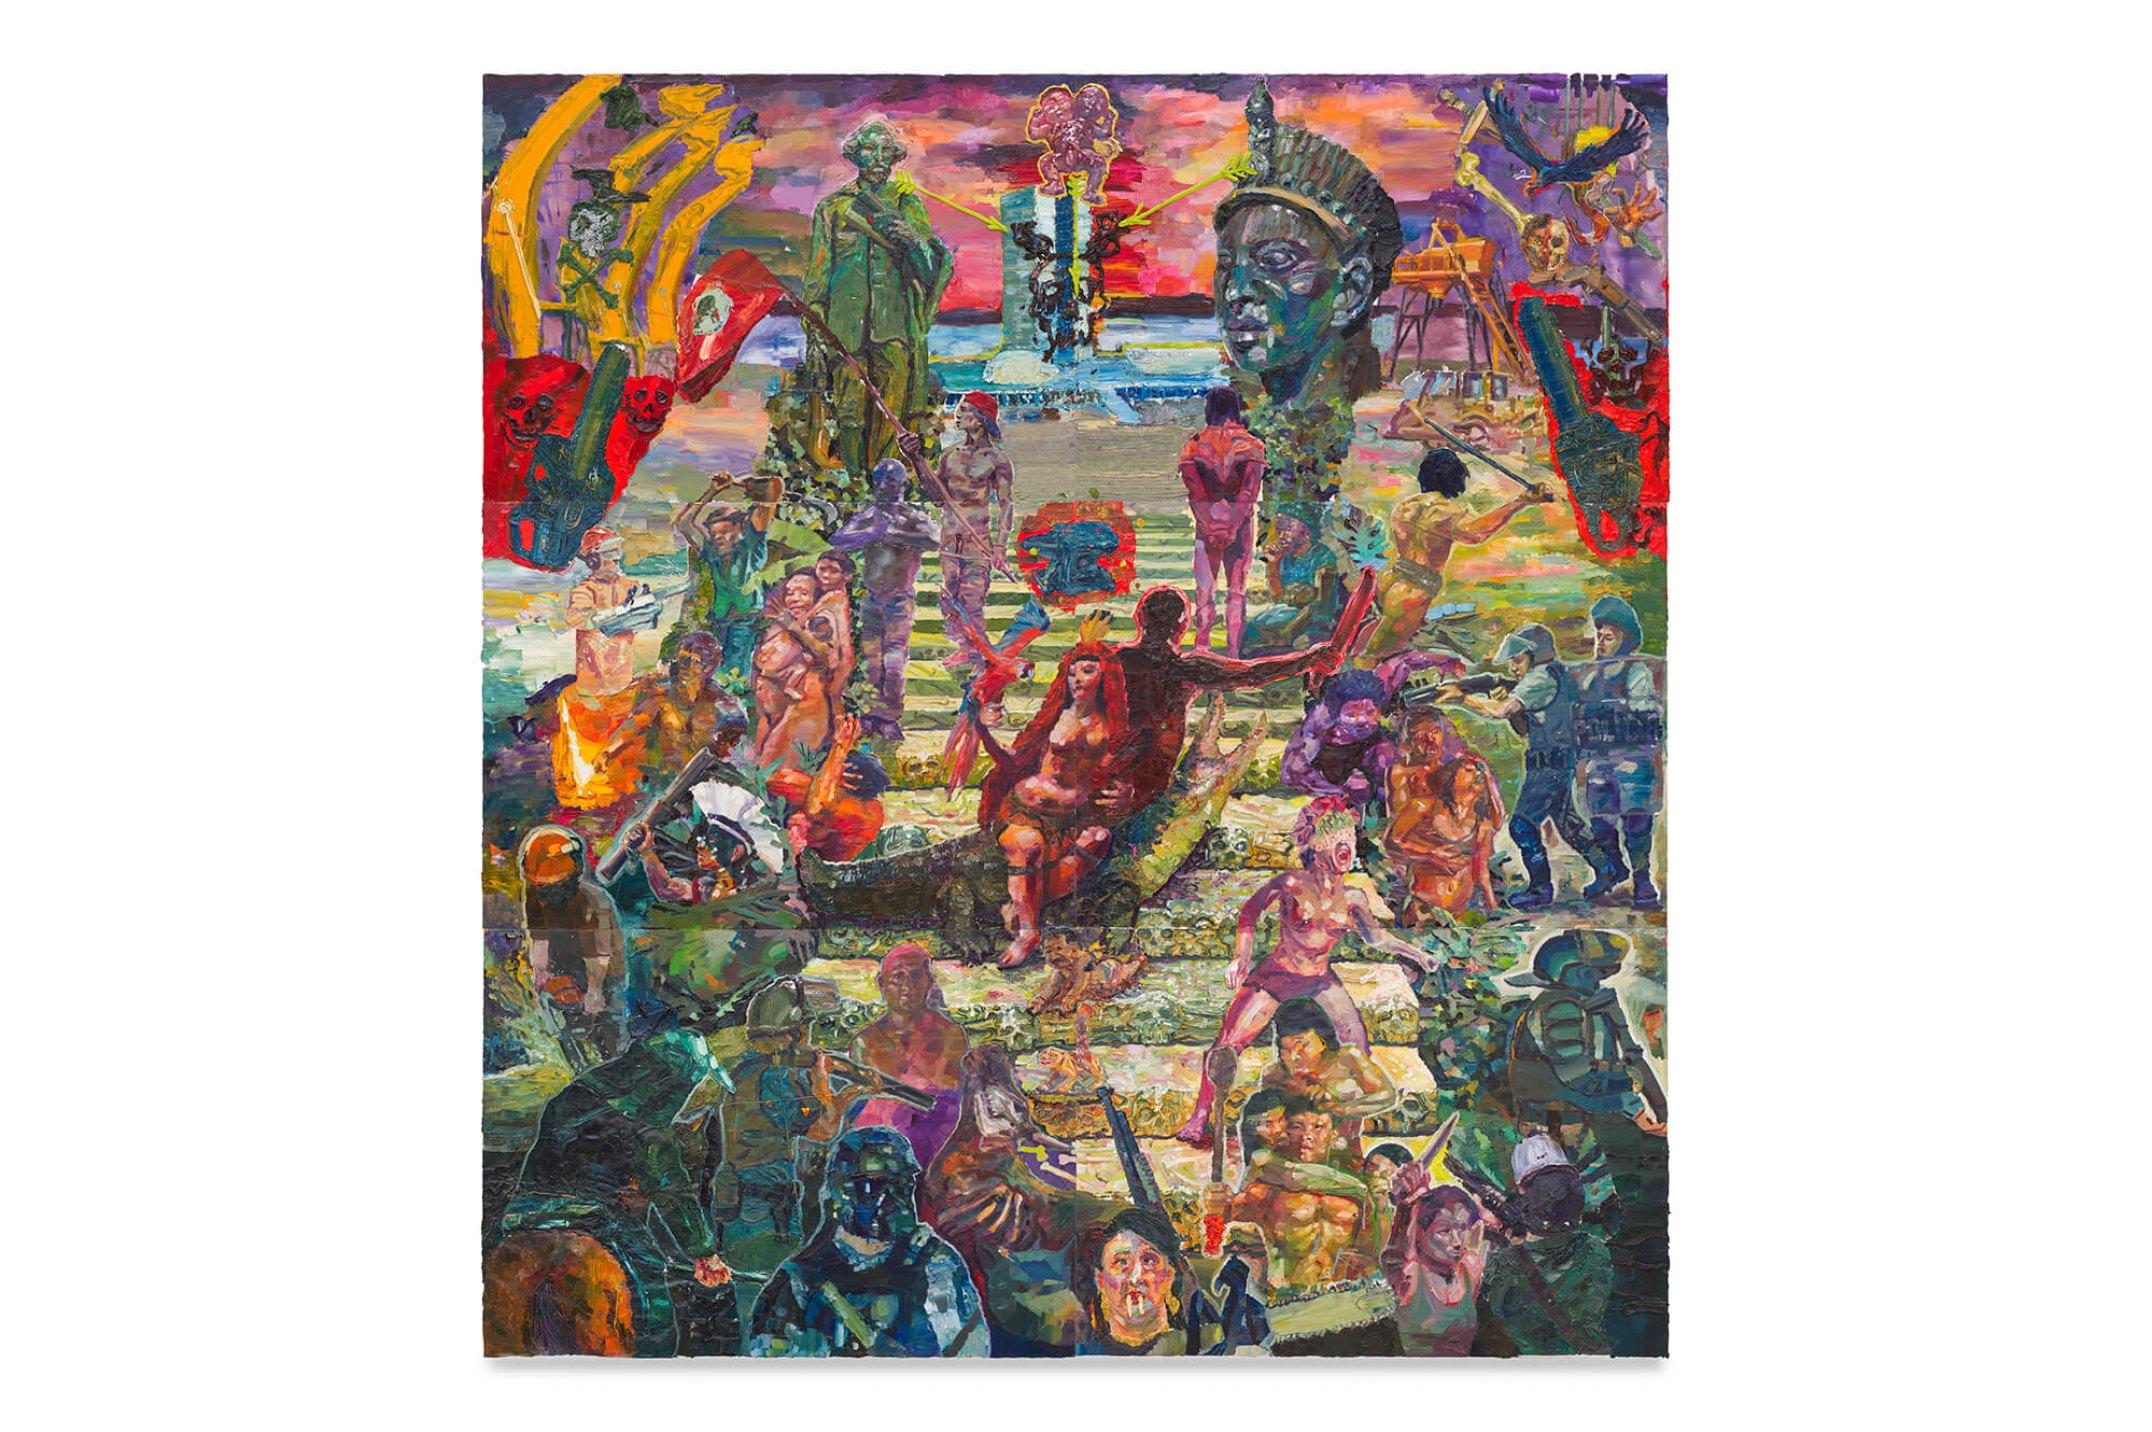 Thiago Martins de Melo,&nbsp;<em>The Mixed-Race Rebis Crowns the Staircase of the Indigents Martyrs</em>, 2013, oil on canvas, 390&nbsp;×&nbsp;360 cm - Mendes Wood DM